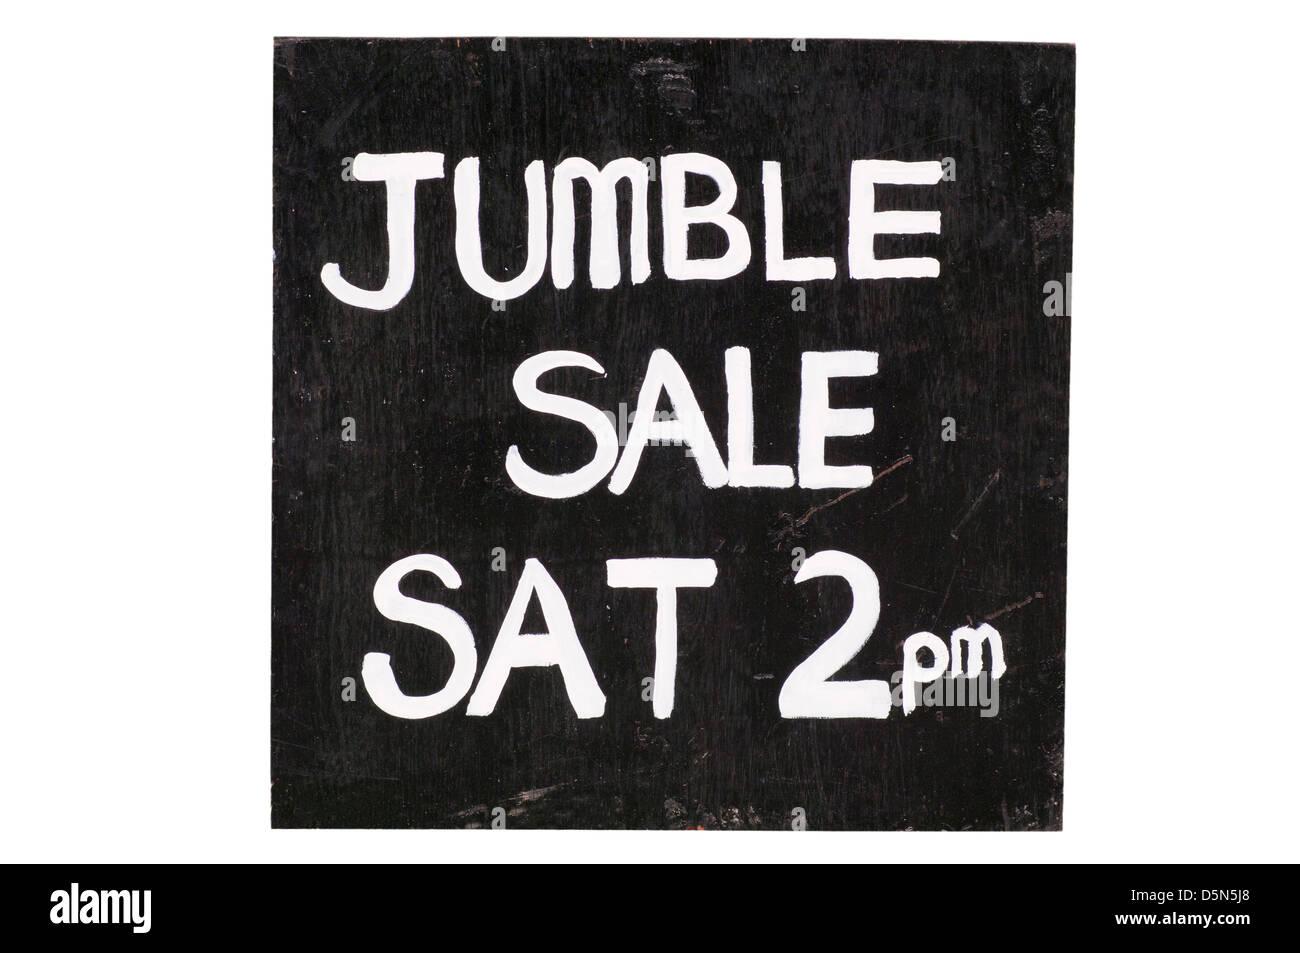 Jumble Sale Sign UK - Stock Image